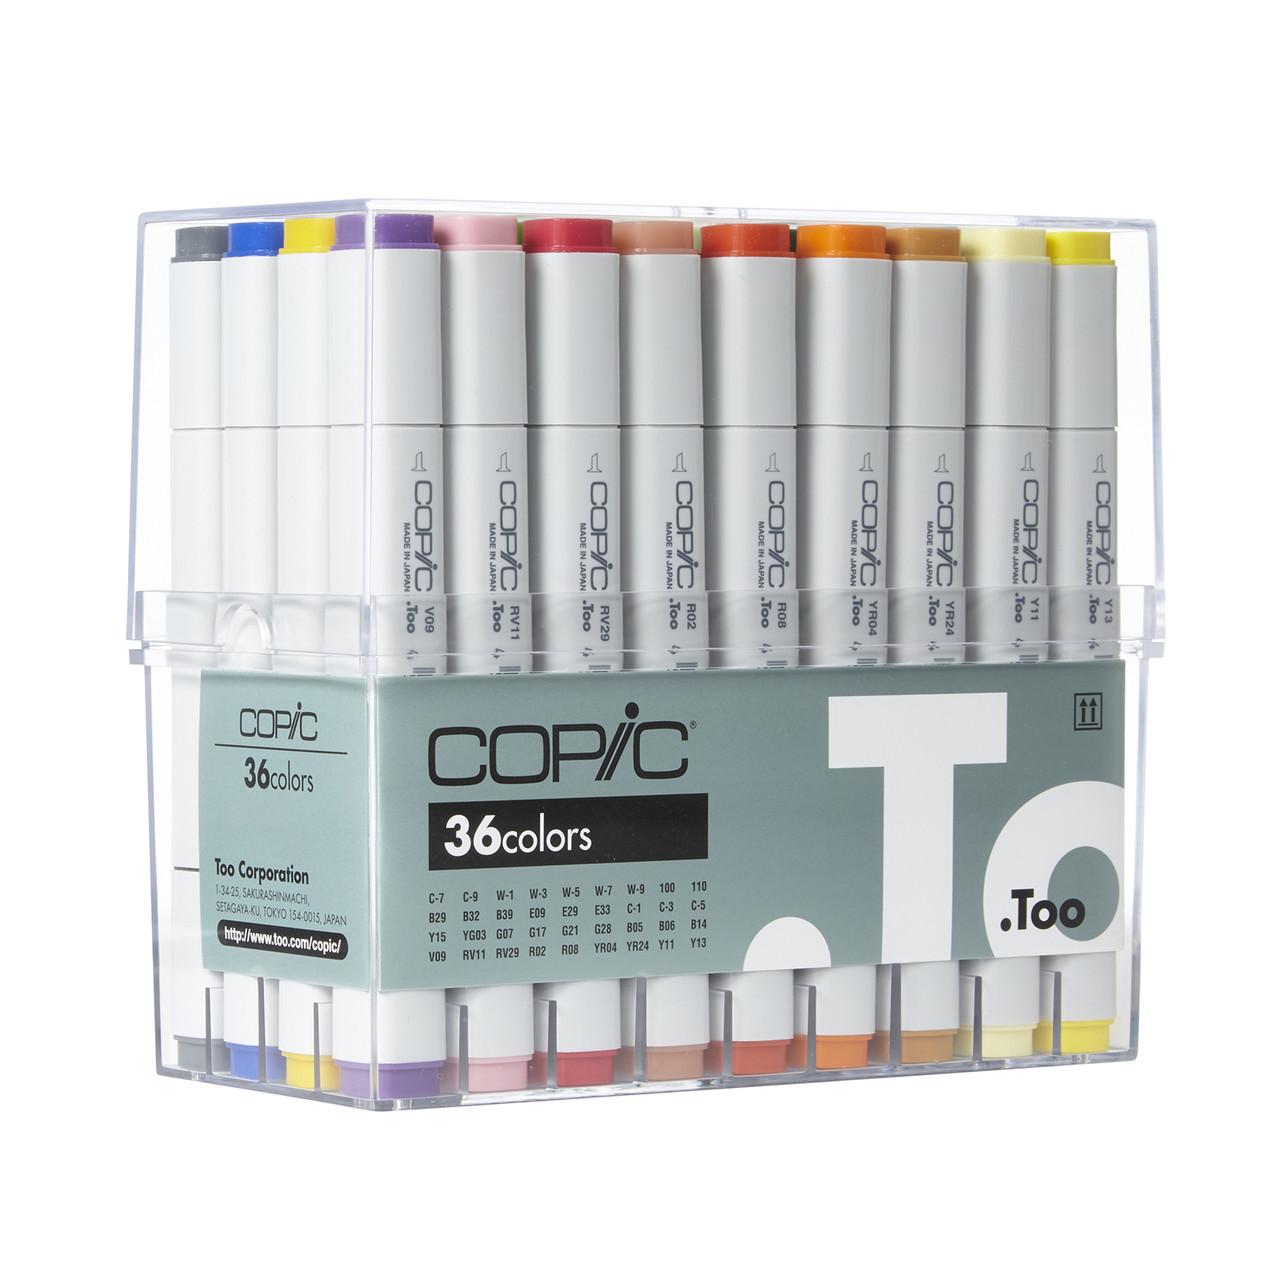 Copic Marker Set